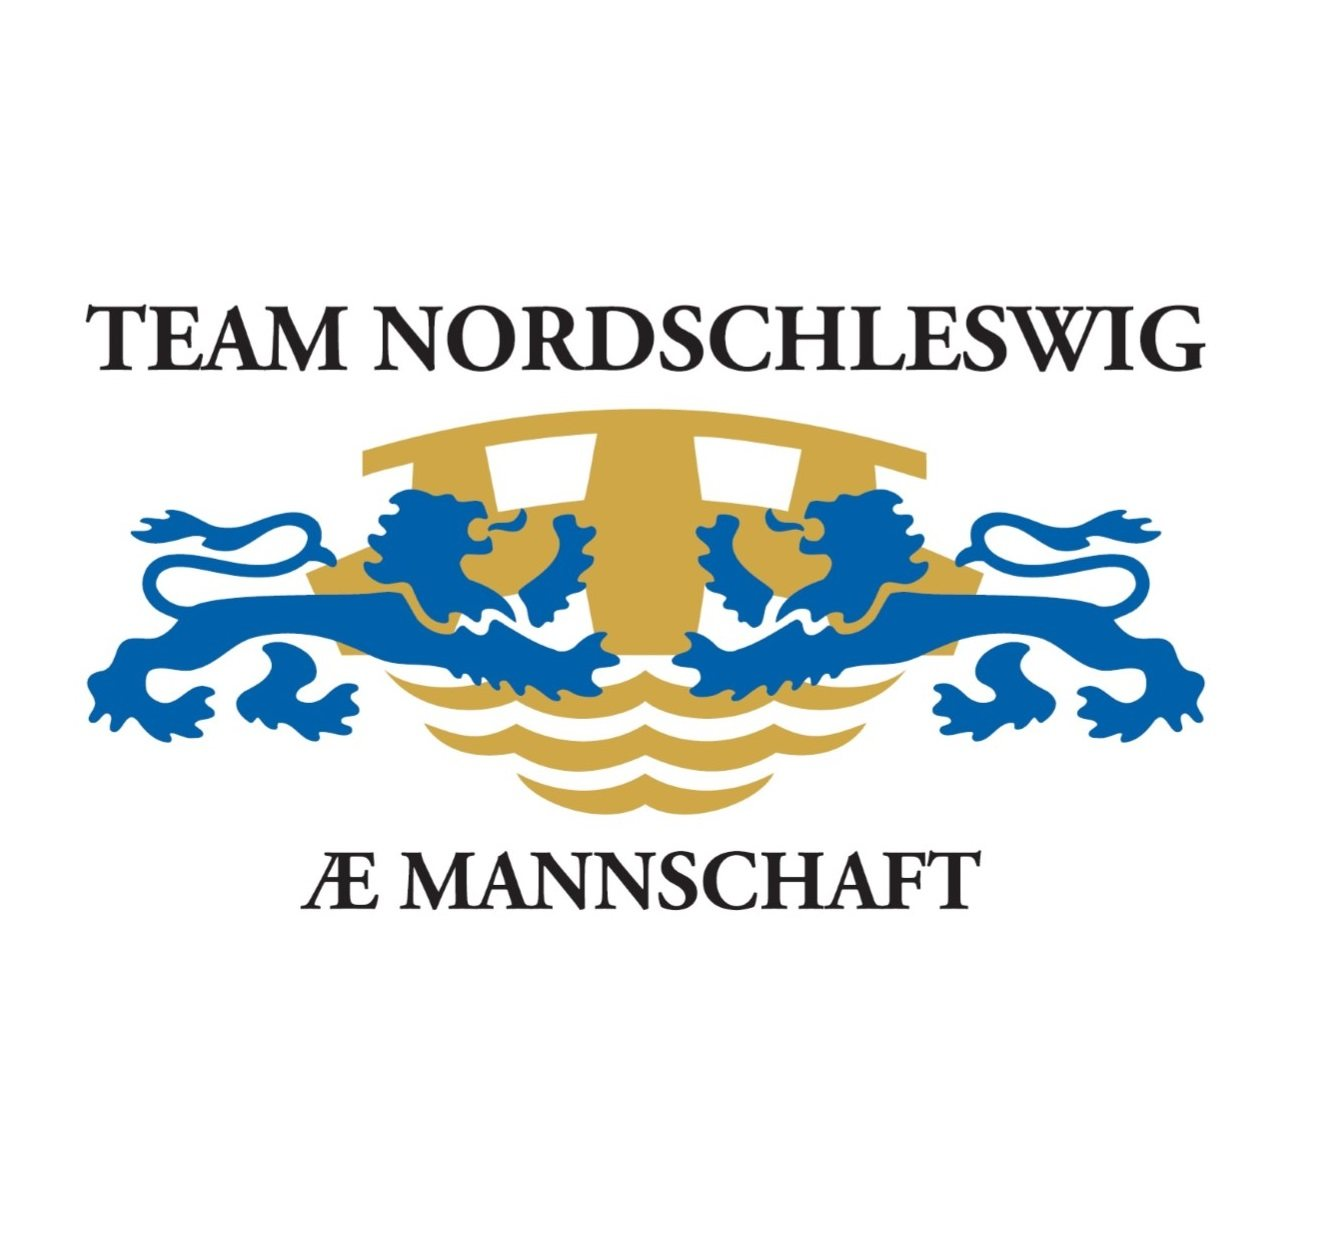 Logo: Team Nordschleswig - Æ Mannschaft